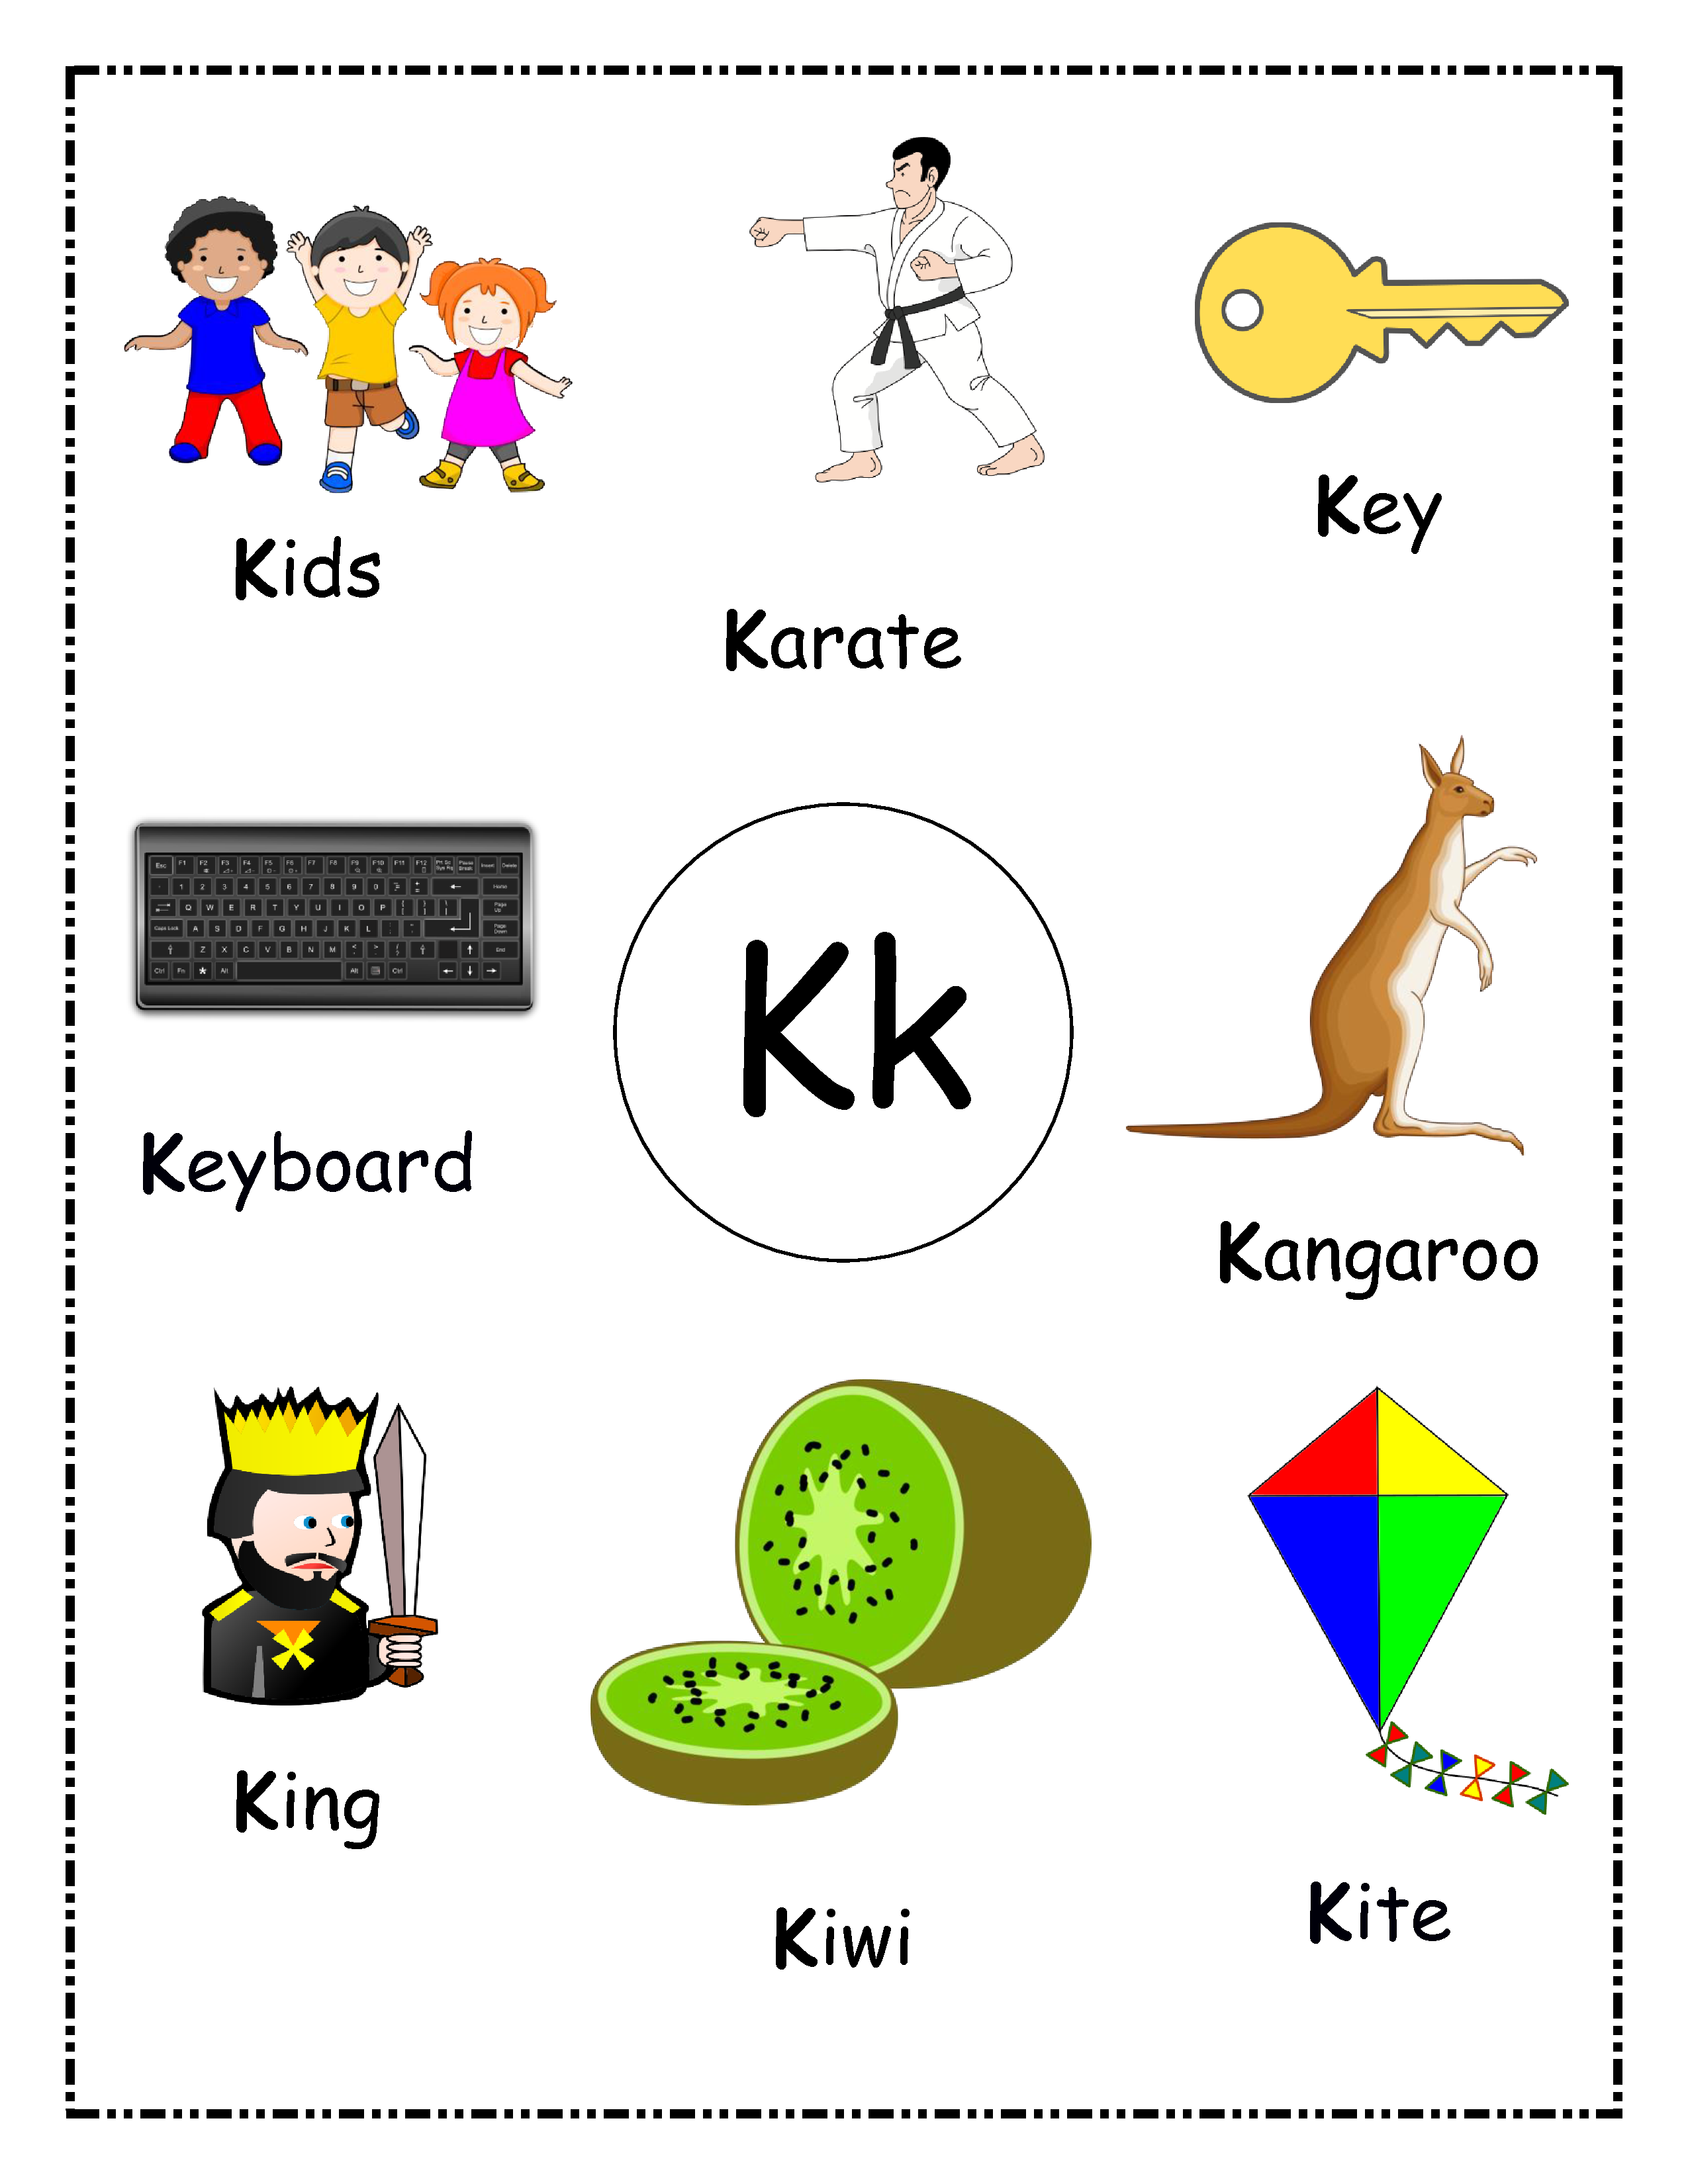 Toddler S Alphabet Picture Book Alphabet Phonics Alphabet For Toddlers Alphabet Worksheets Preschool [ 3300 x 2550 Pixel ]